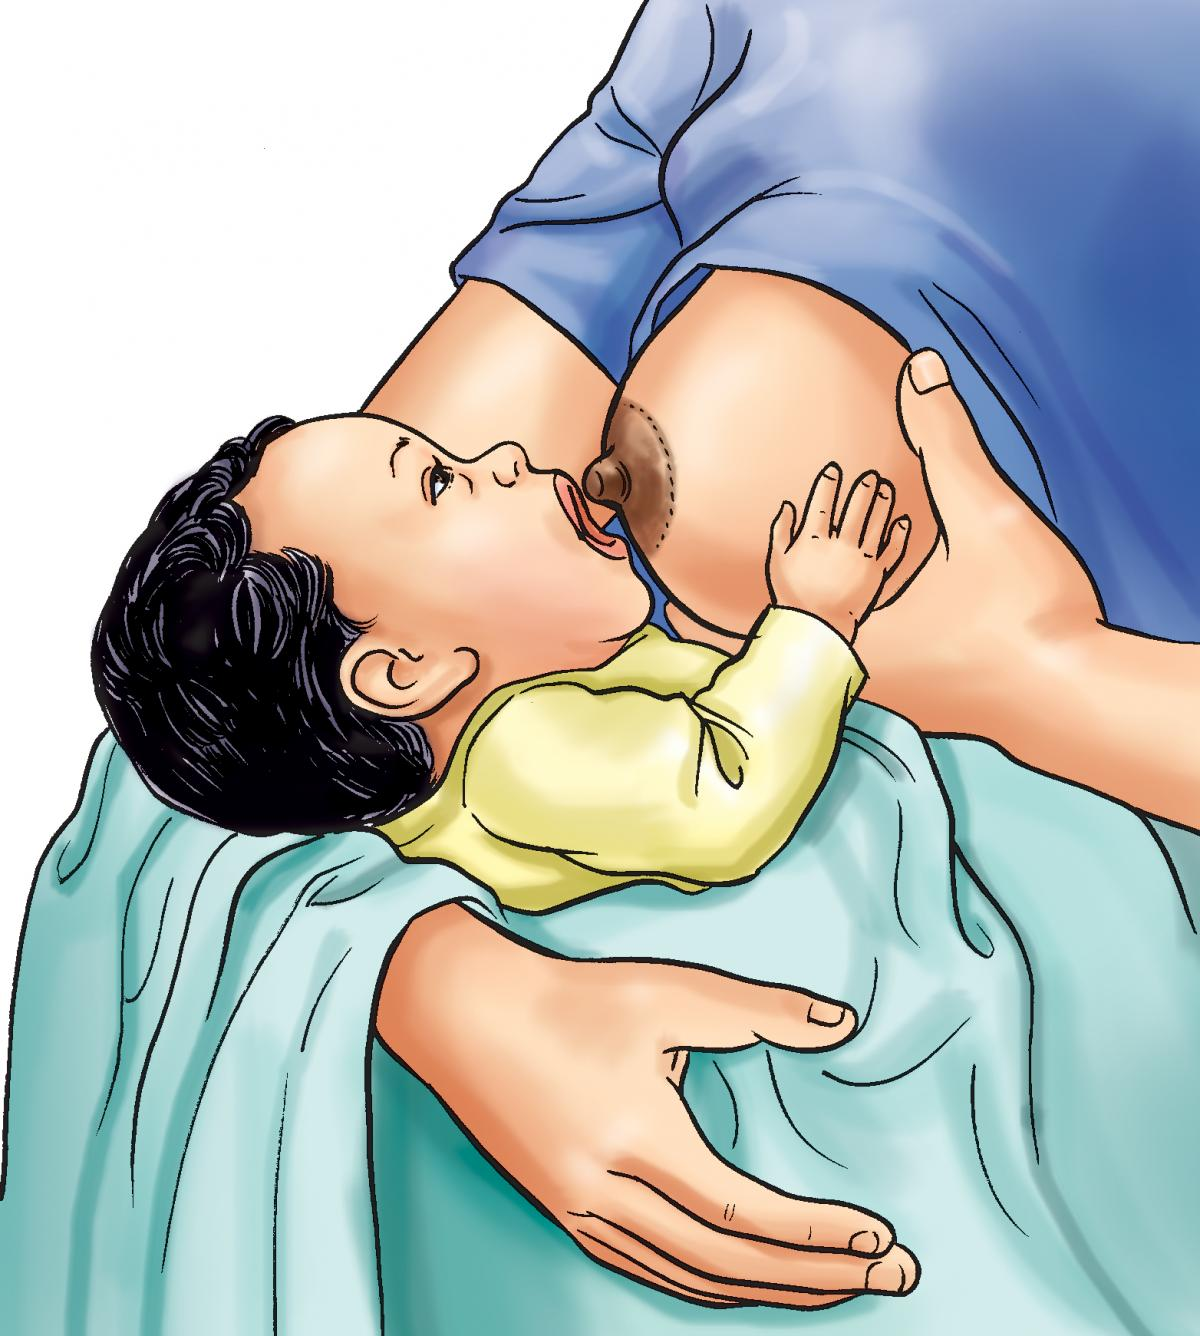 Breastfeeding - Breastfeeding pre-attachment 0-6mo - 05 - Nepal